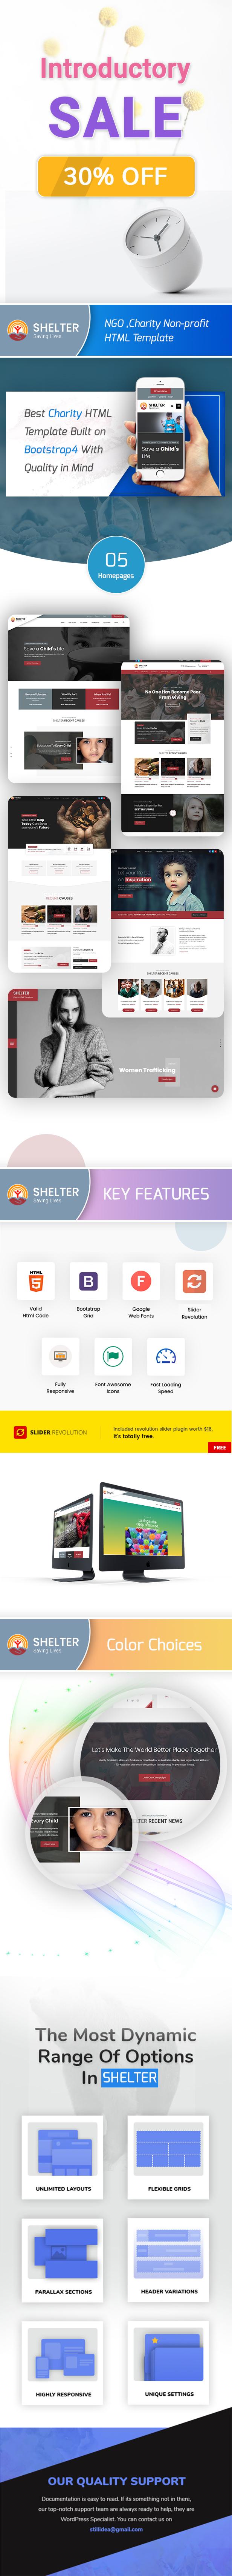 Shelter - Multipurpose Charity Non-profit HTML Template - 1